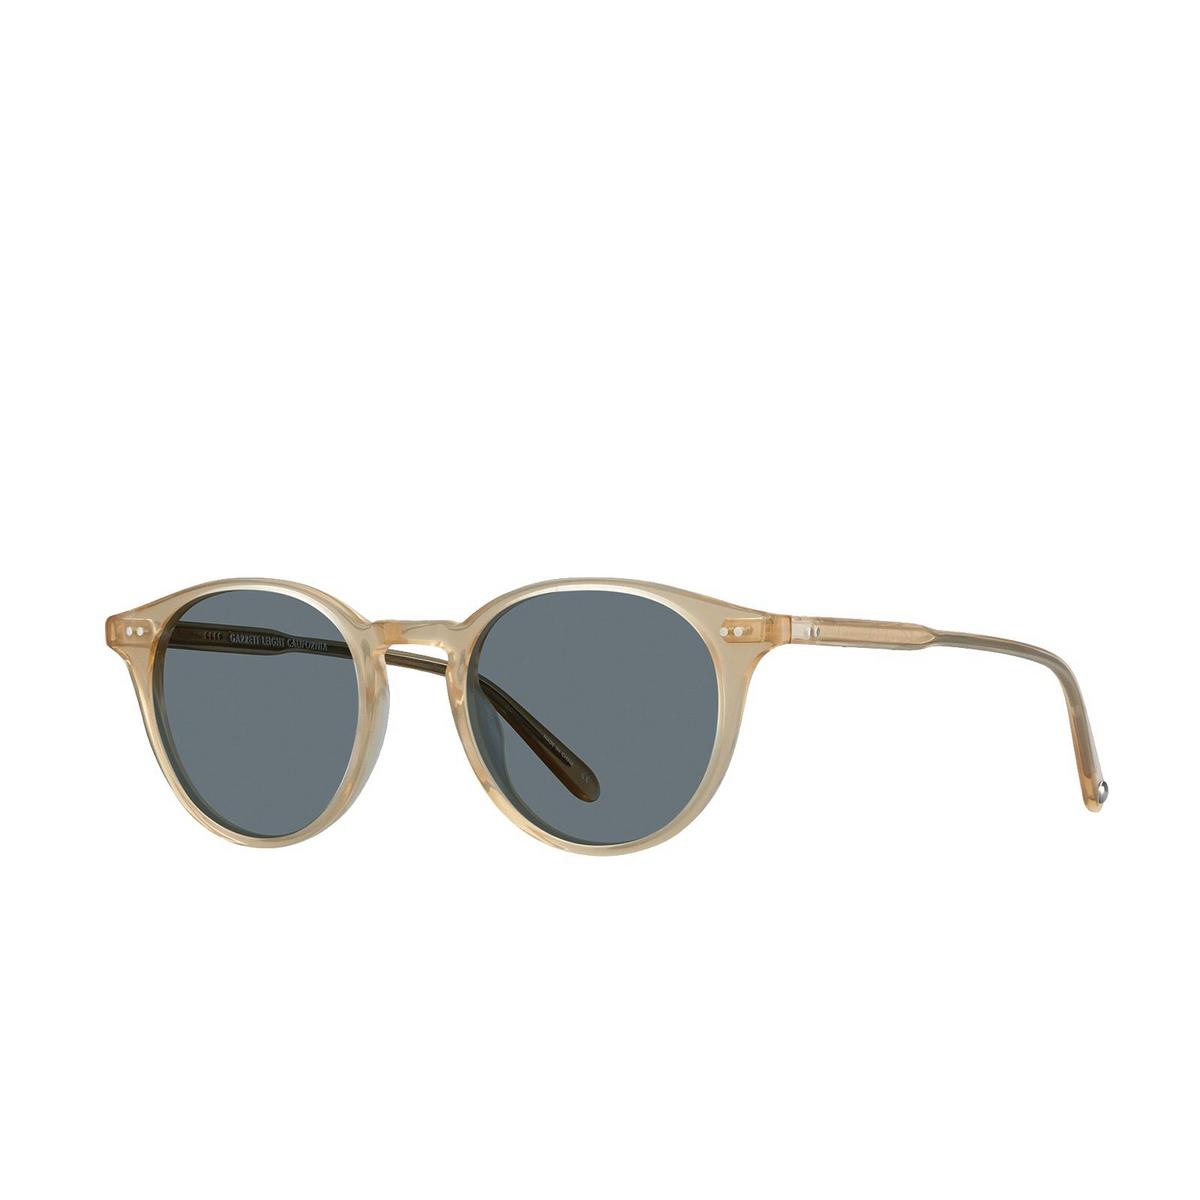 Garrett Leight® Round Sunglasses: Clune Sun color Blonde B-sfbs - 2/2.